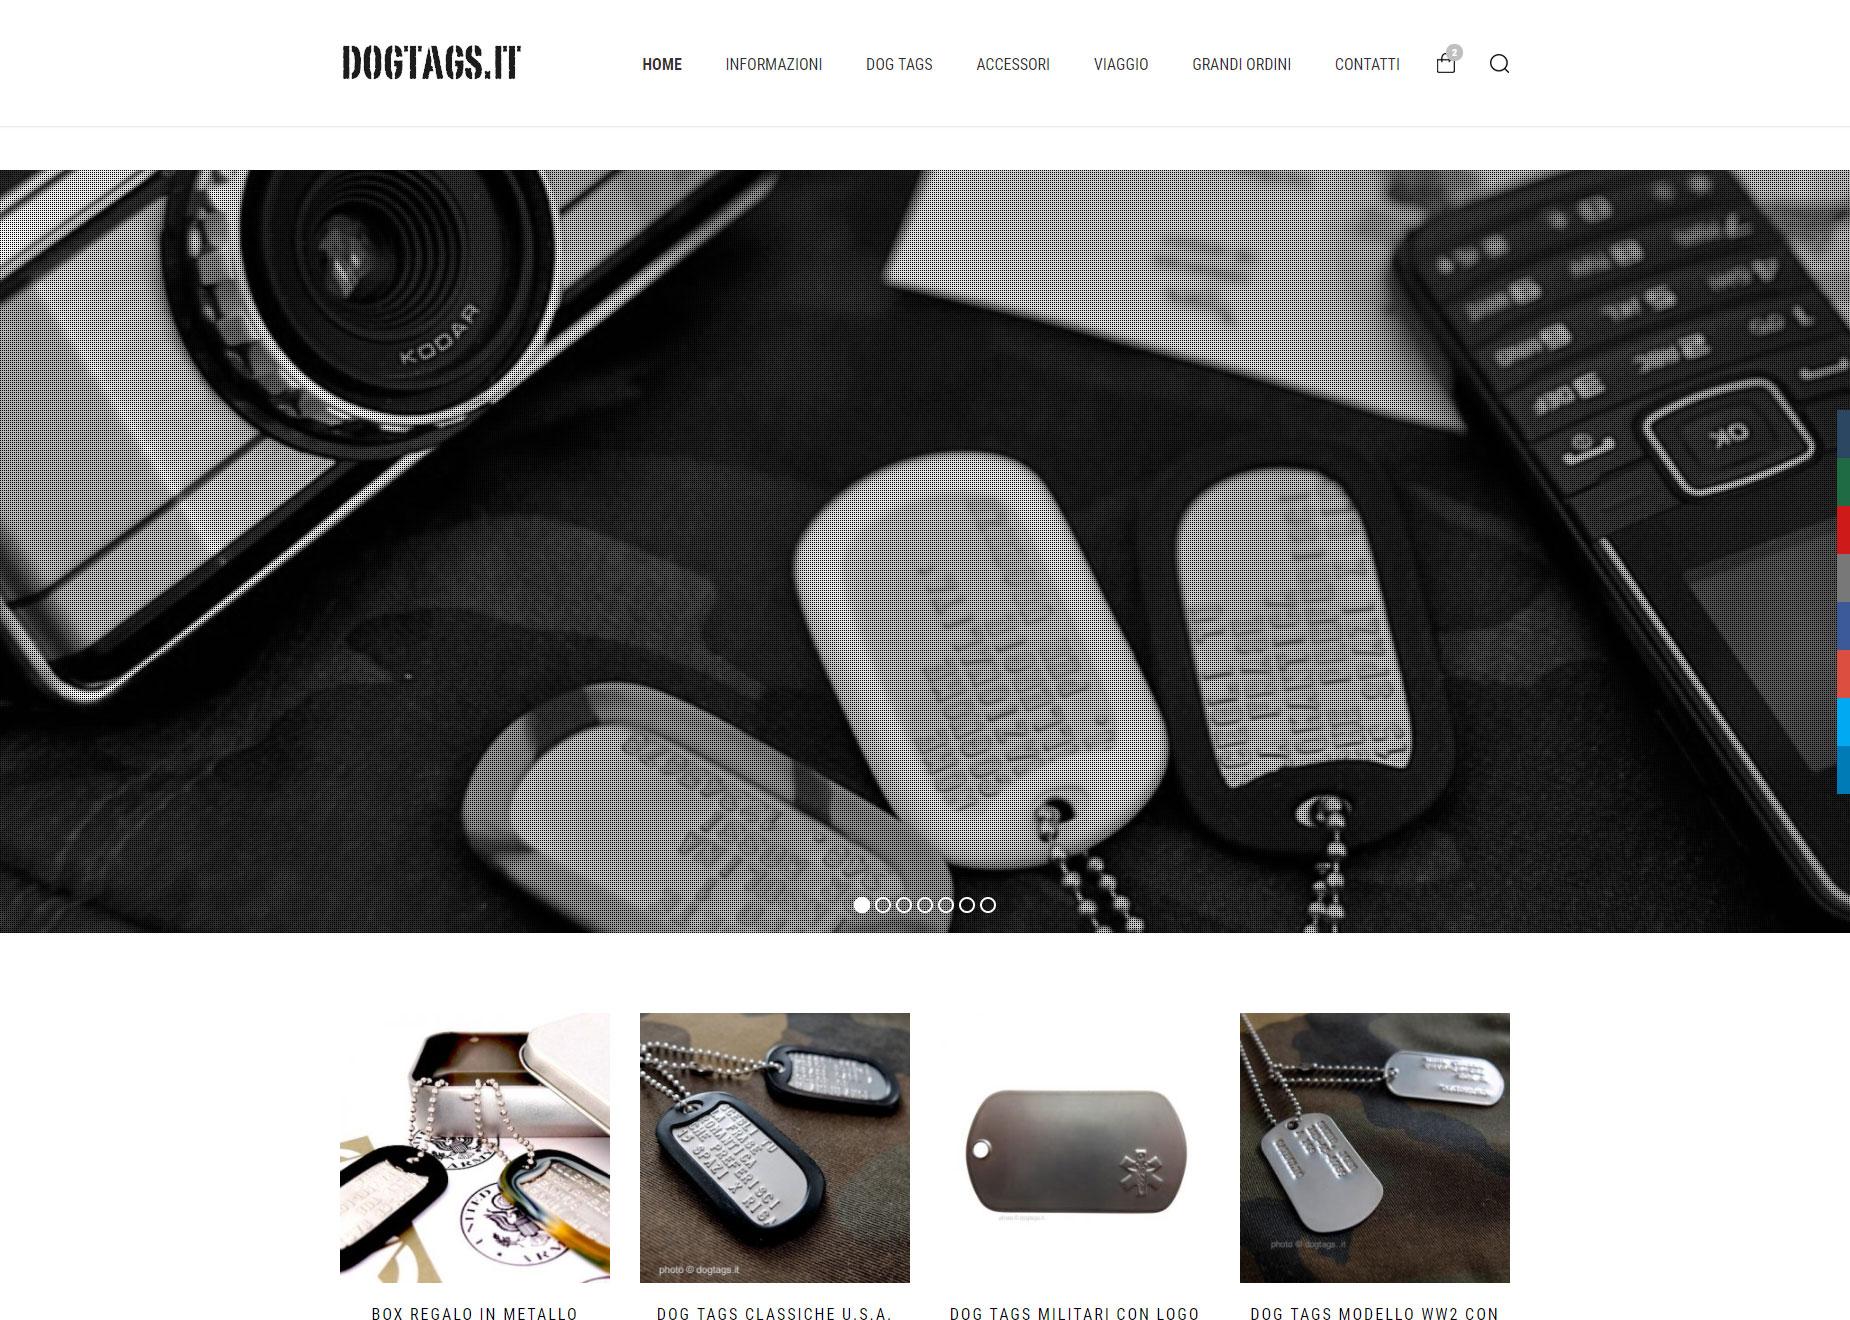 screencapture-dogtags-it-2018-04-17-09_36_54